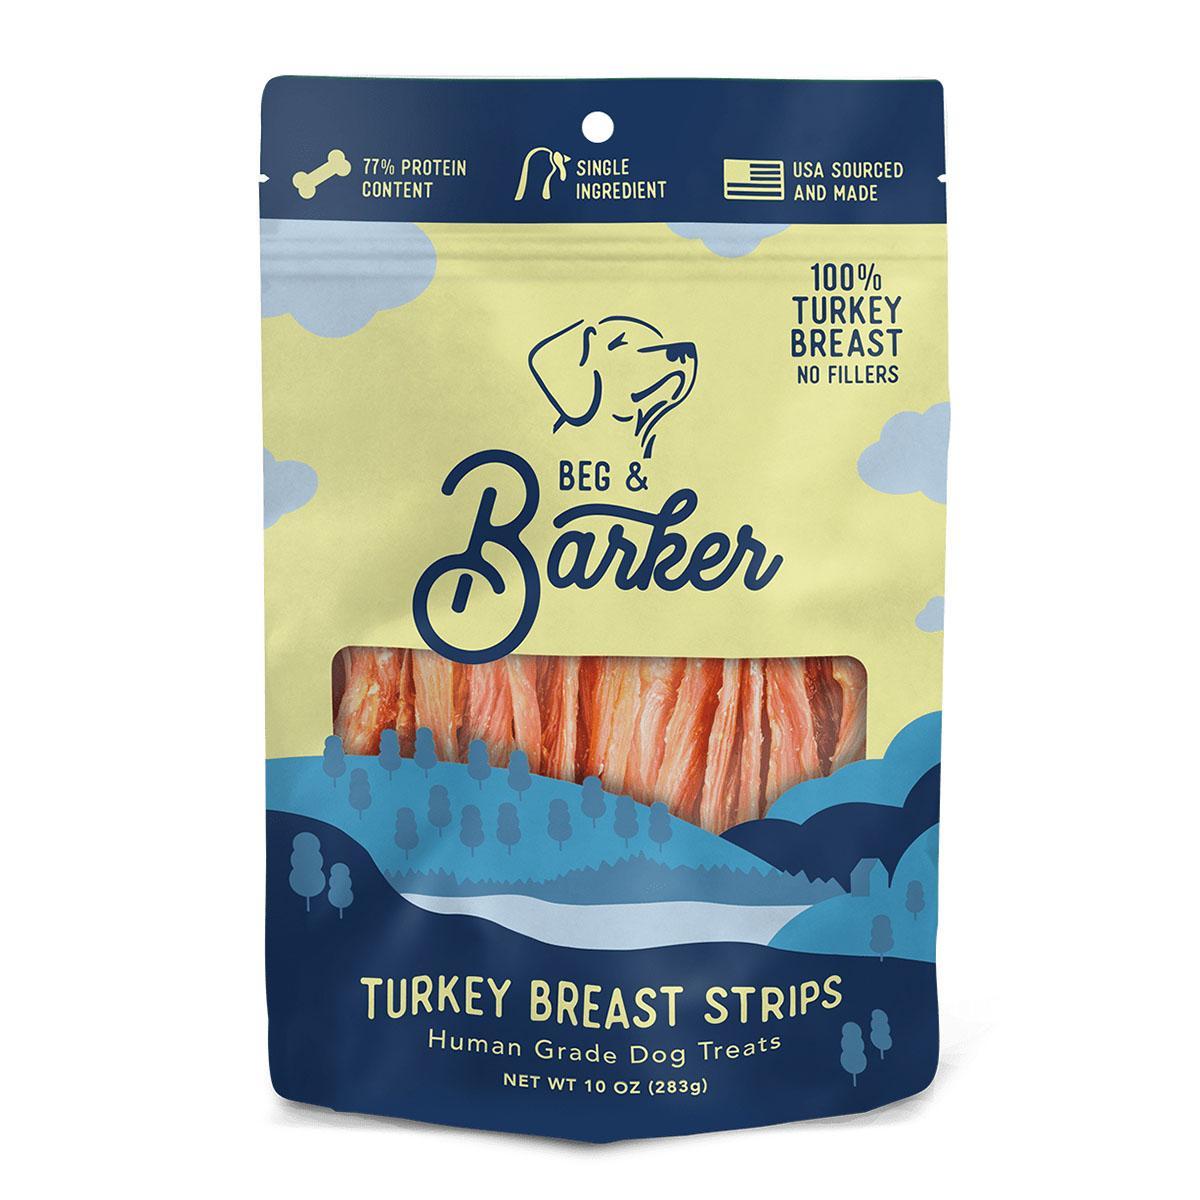 Beg & Barker Turkey Breast Strips Dog Treats